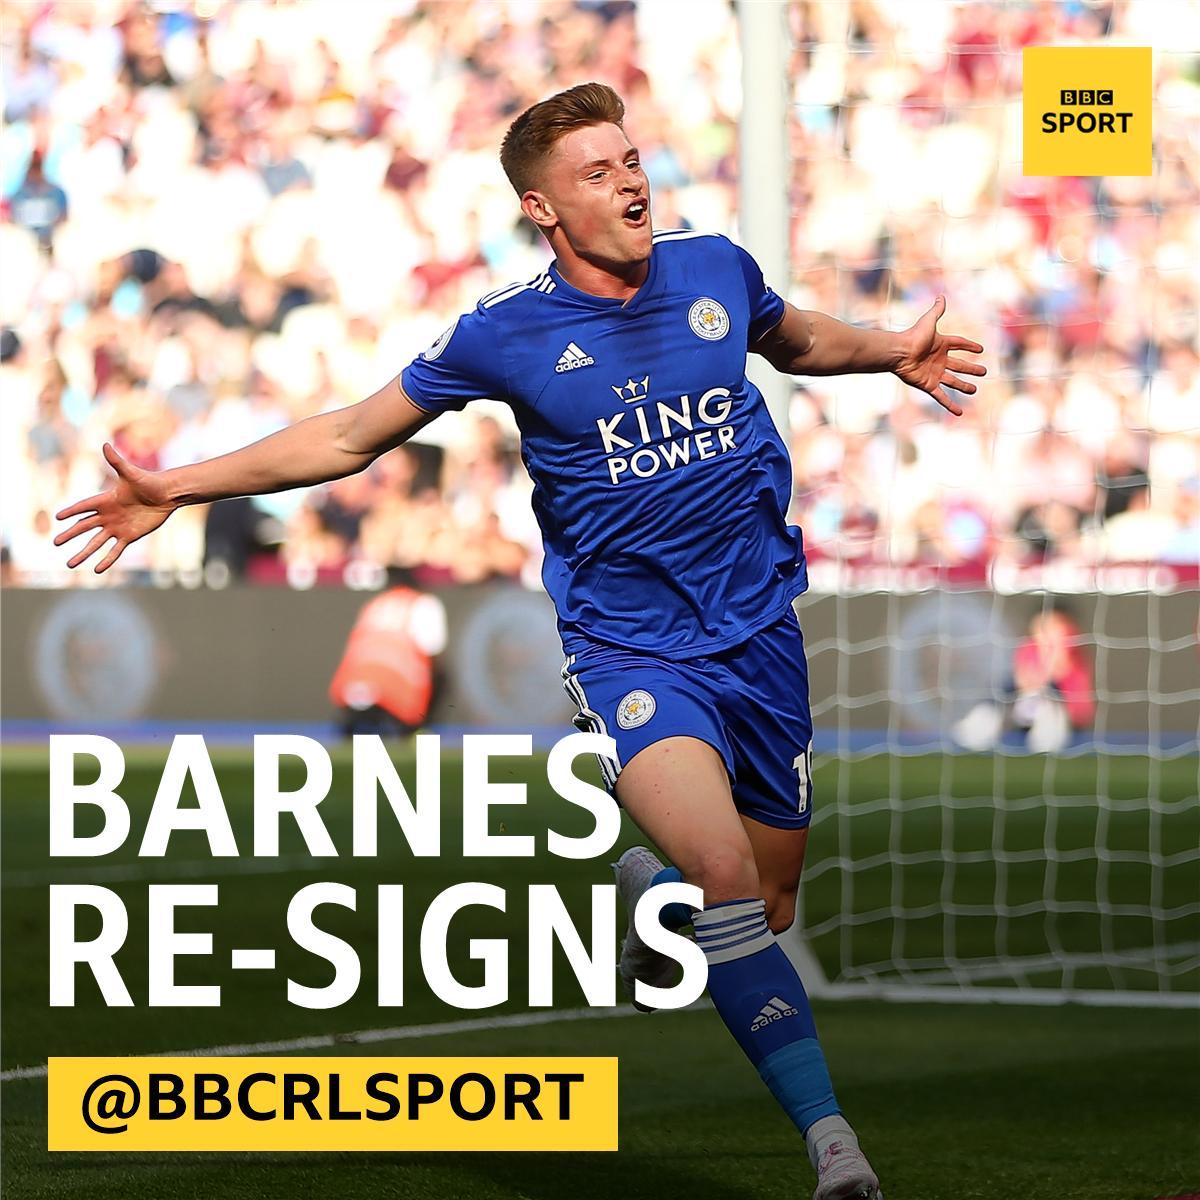 @BBCRLSport's photo on Harvey Barnes